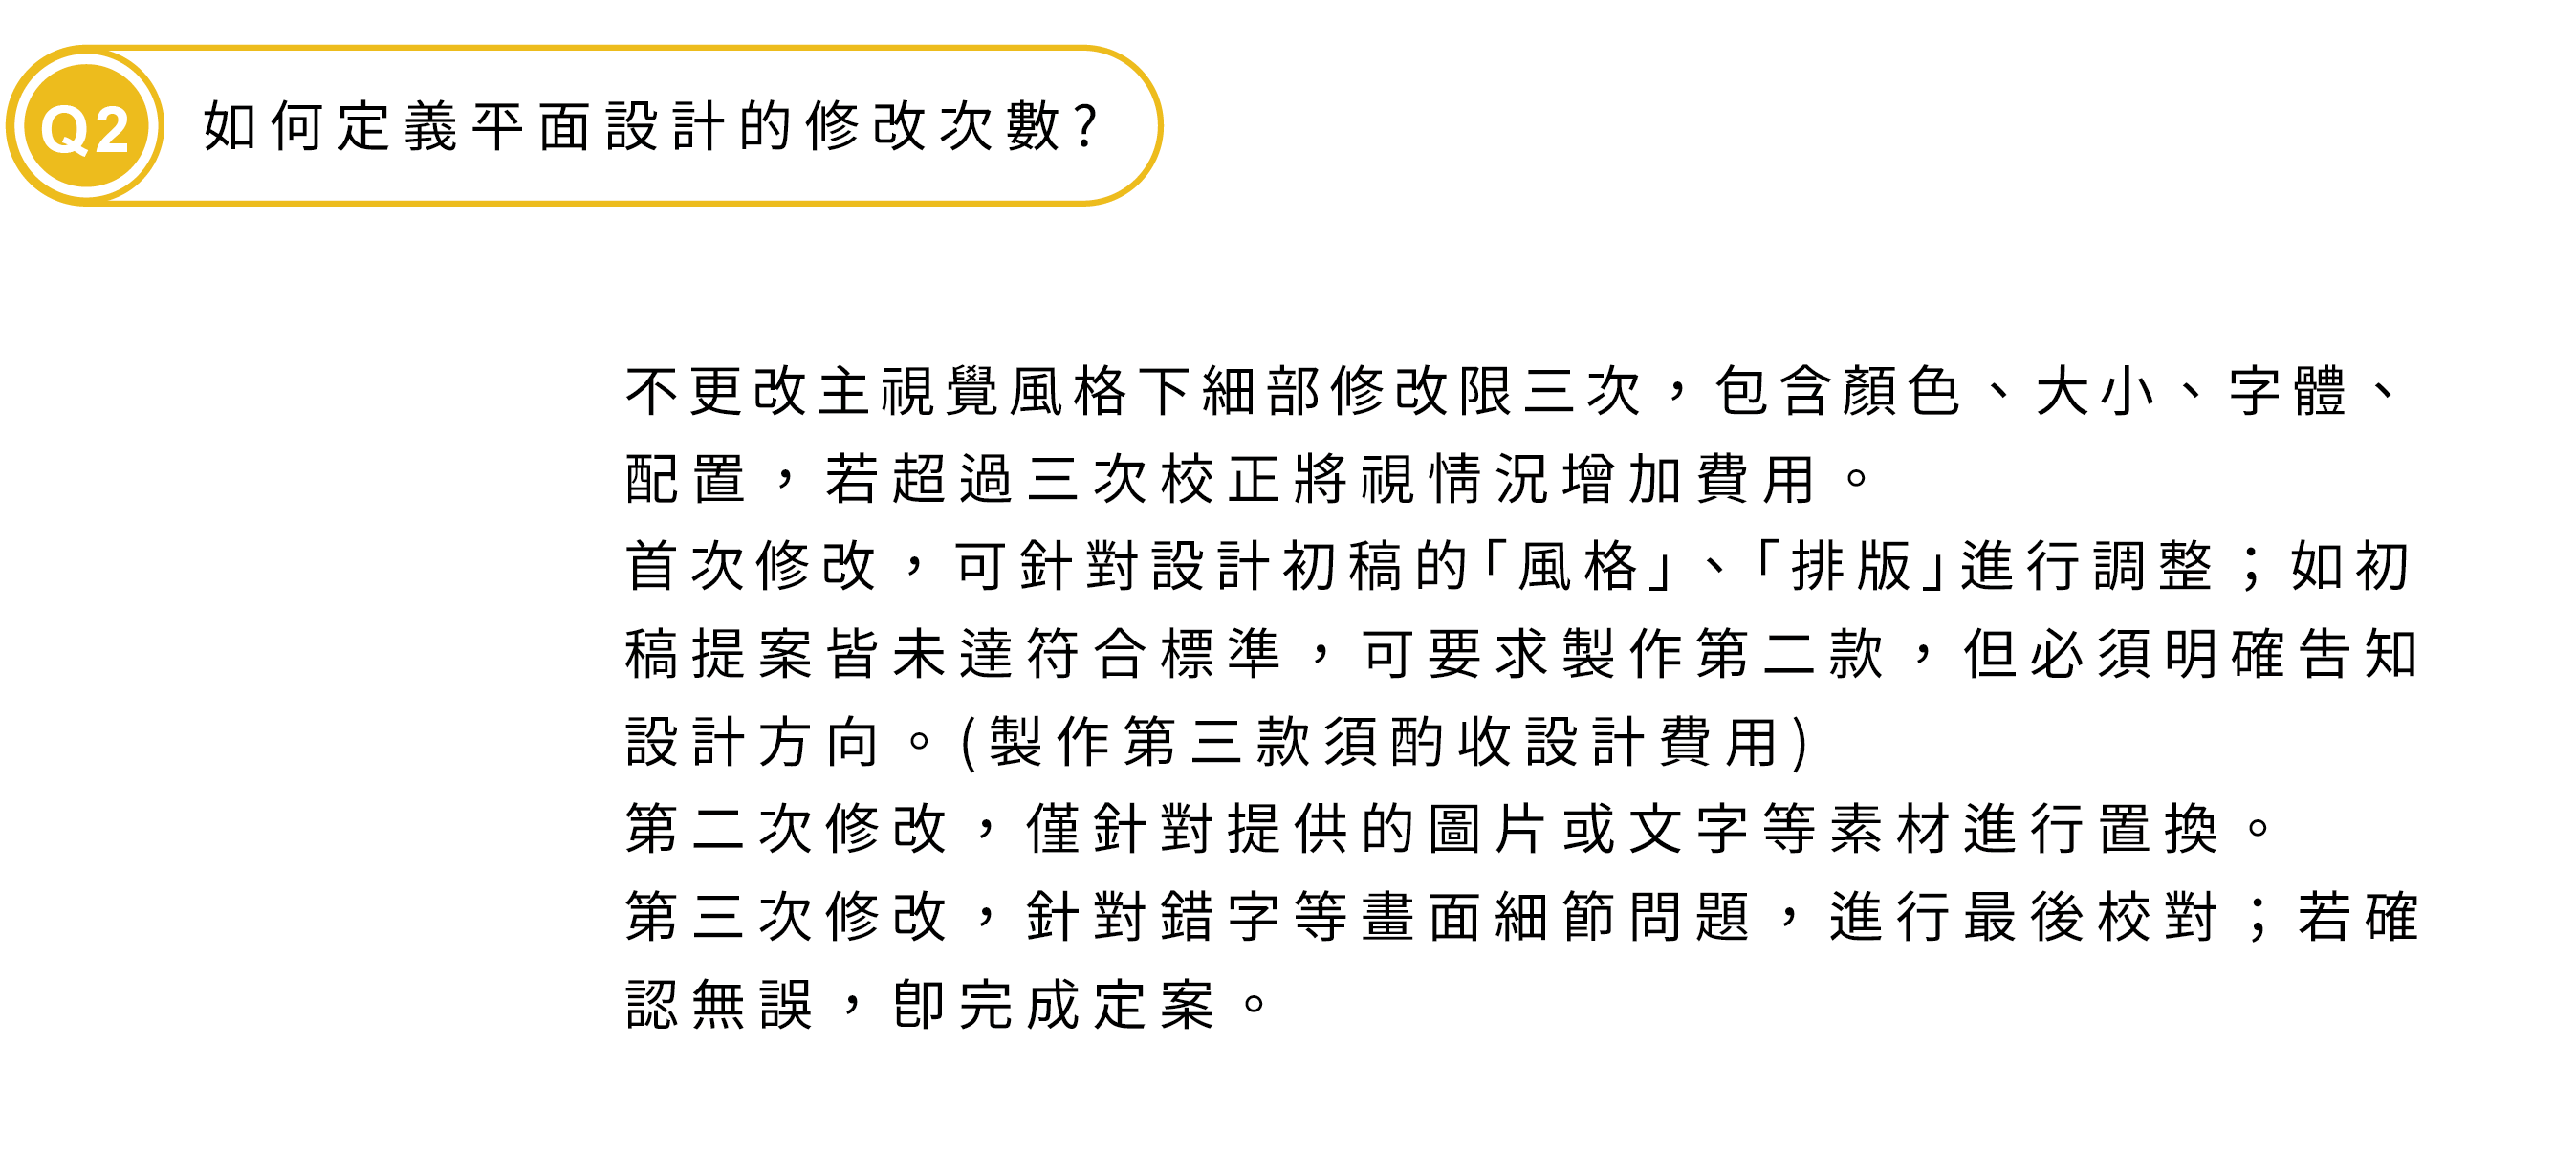 Q2-12 (1)